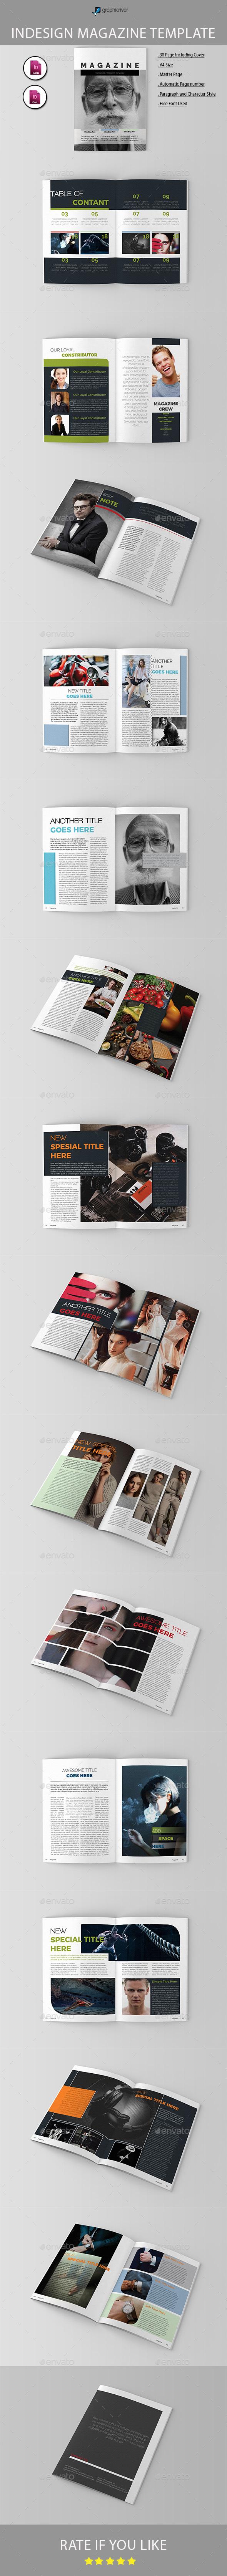 Magazine Template03 - Magazines Print Templates